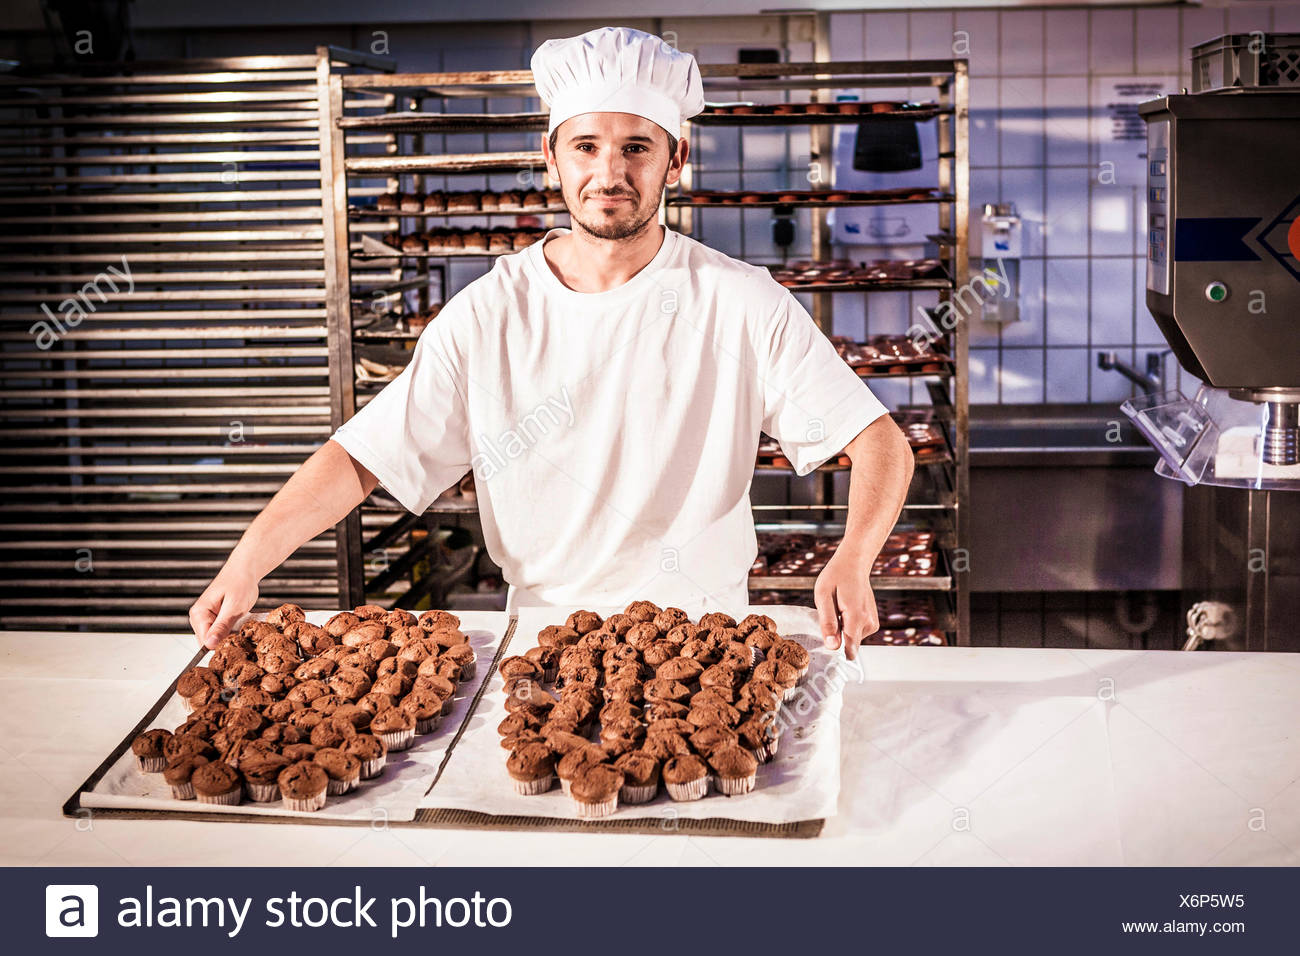 Pastelería presentación de bandejas para hornear con pasteles Imagen De Stock